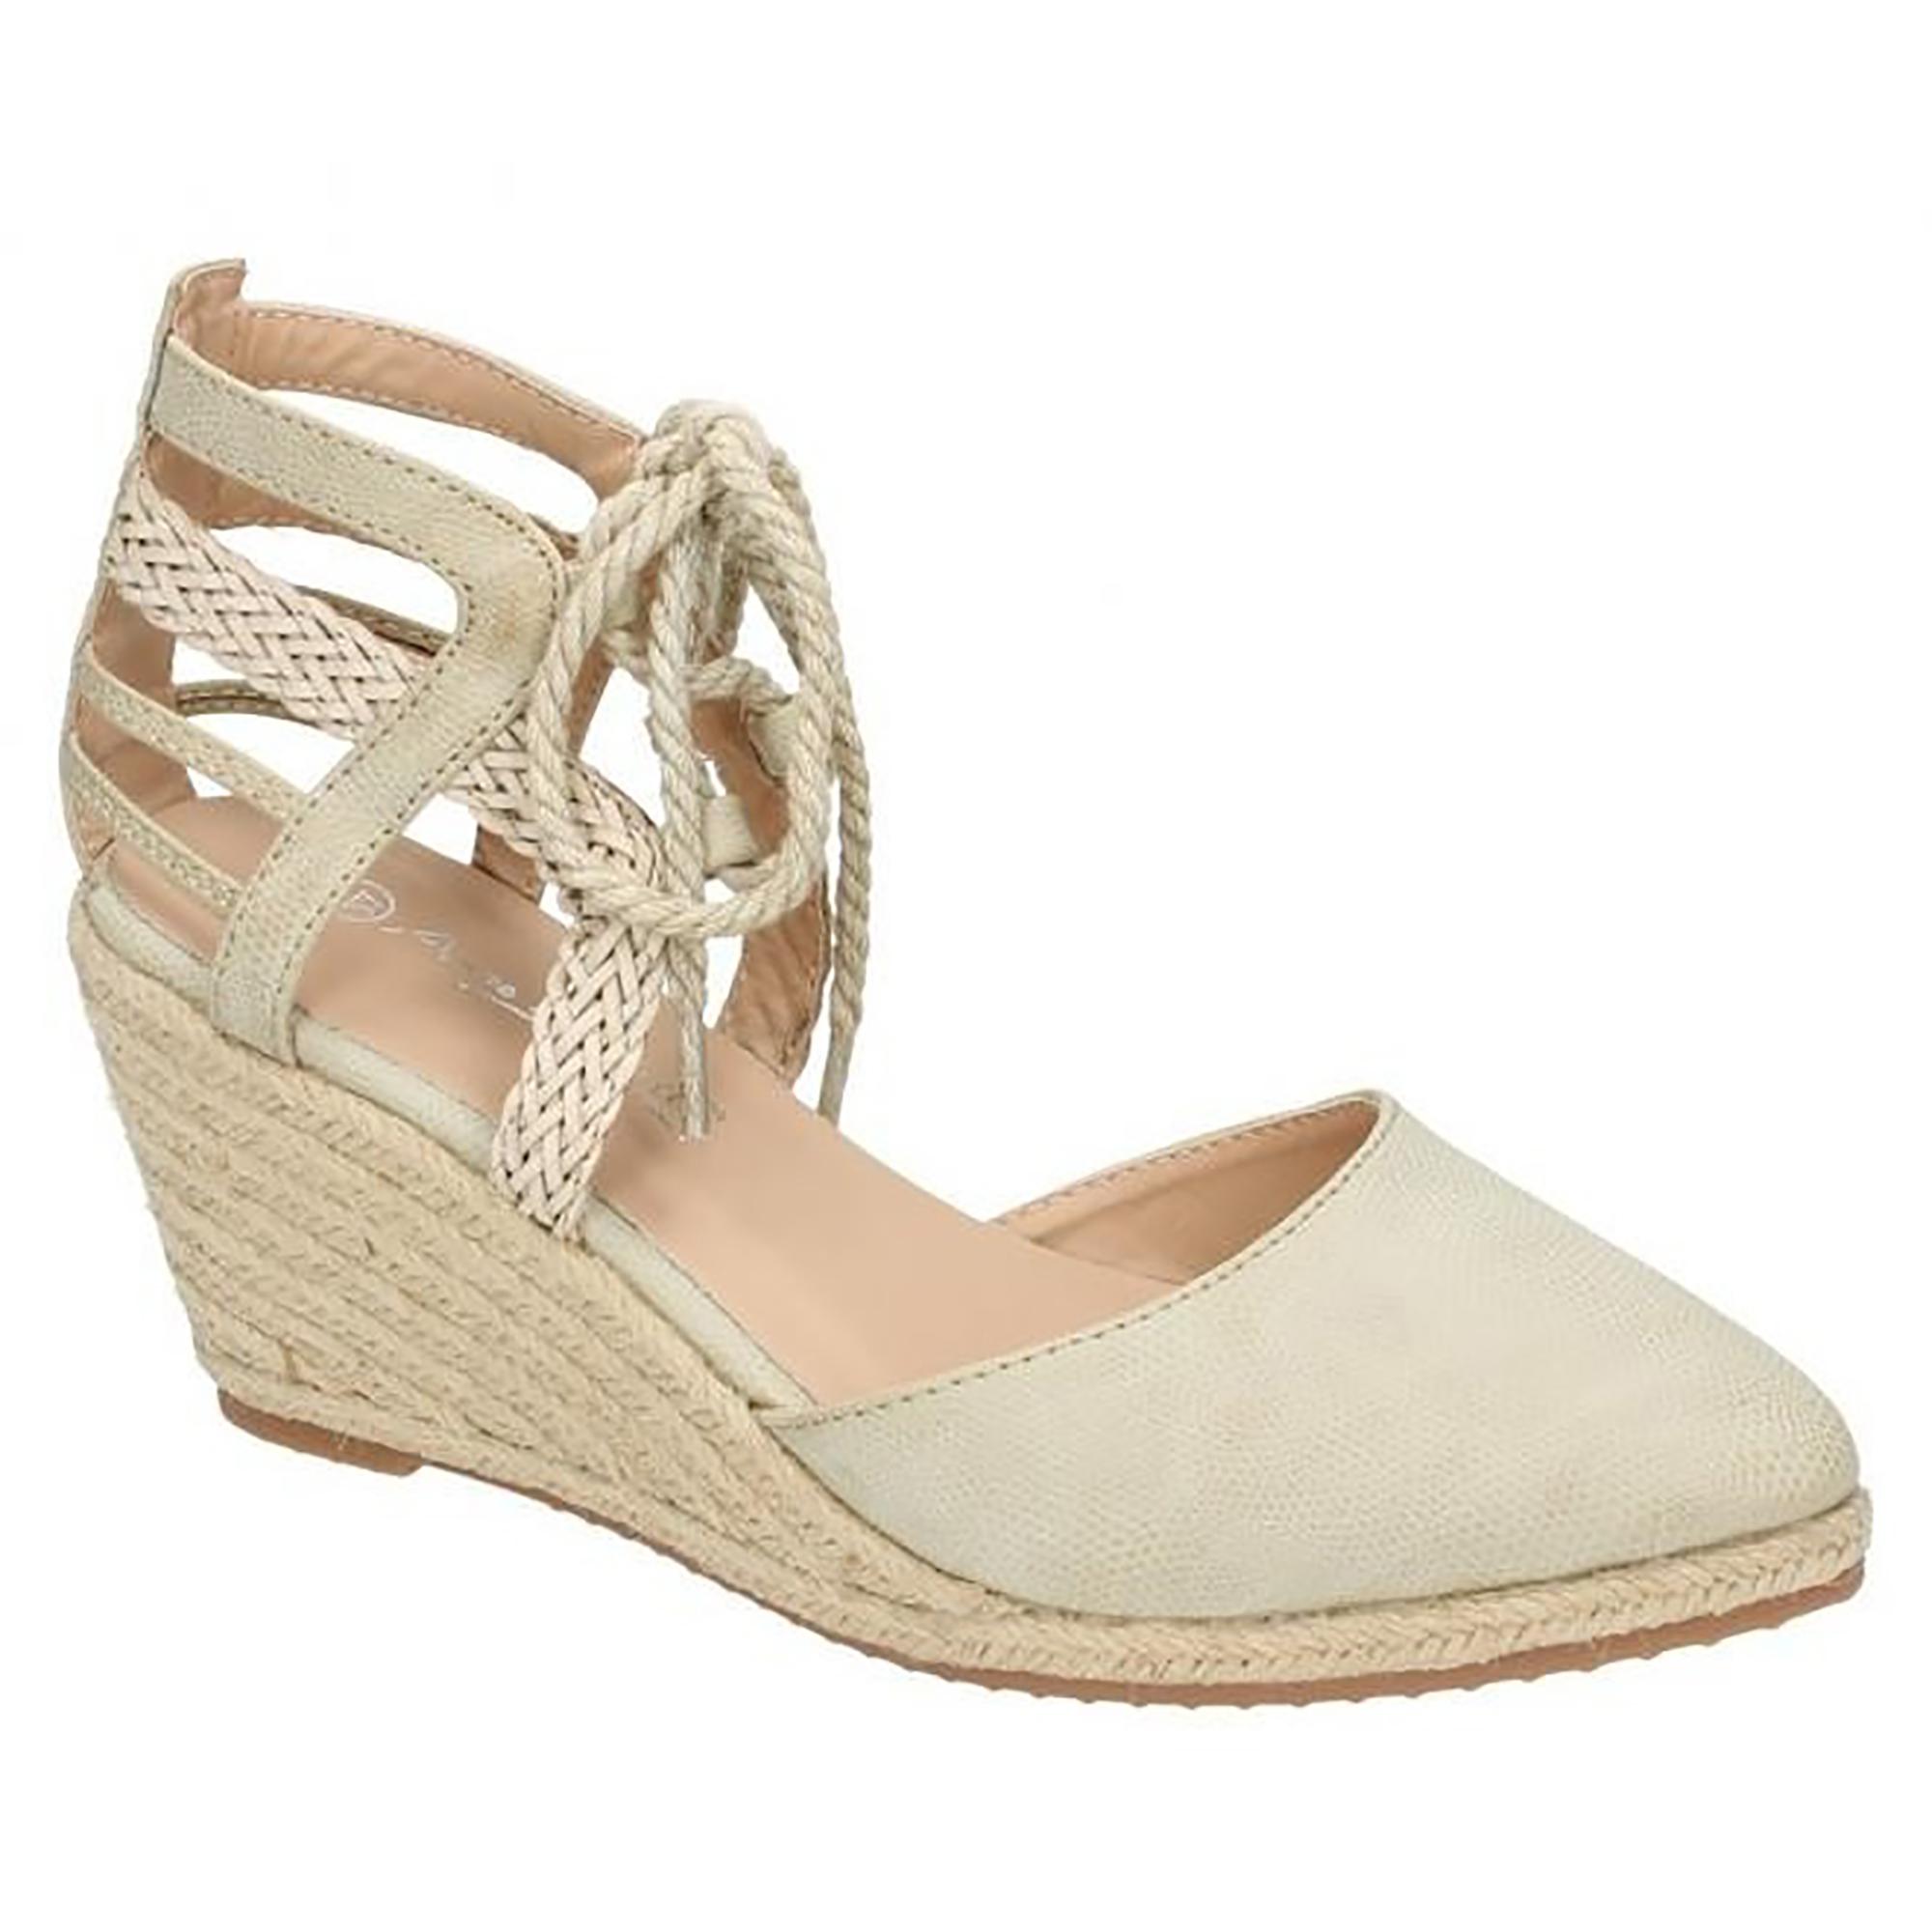 Creative Women39s BraidedRope Sandals  Fashion Amp Beauty  Pinterest